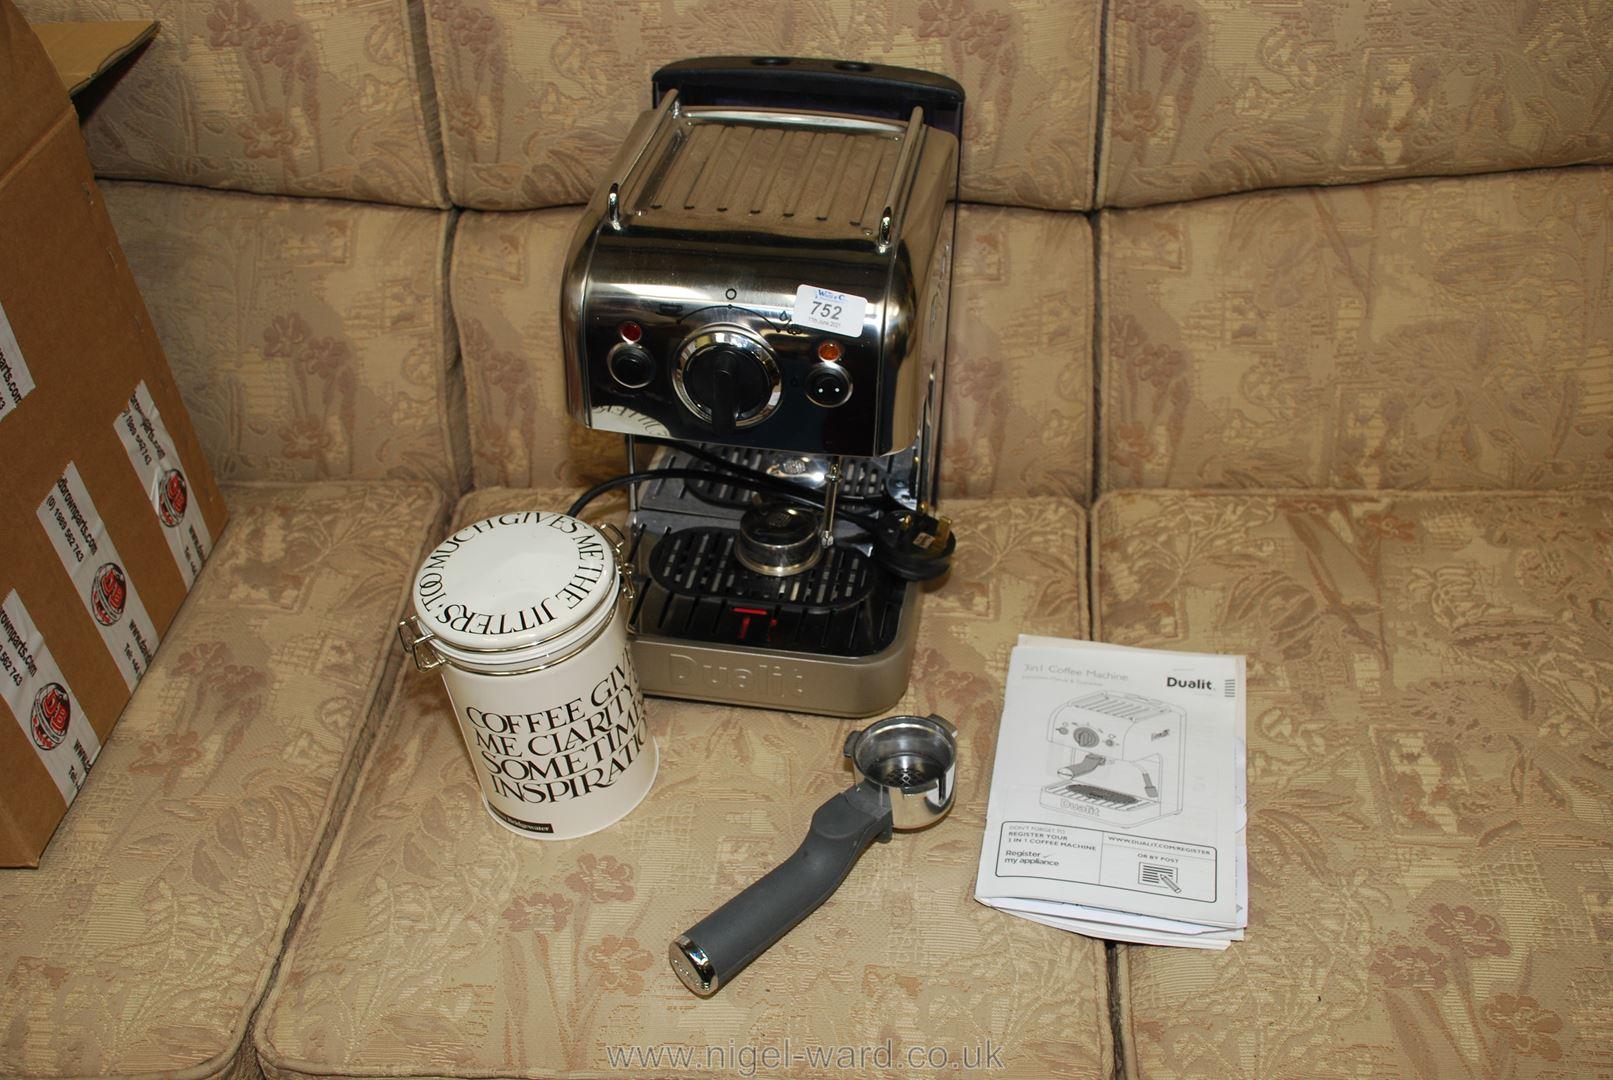 A Dualit coffee machine.